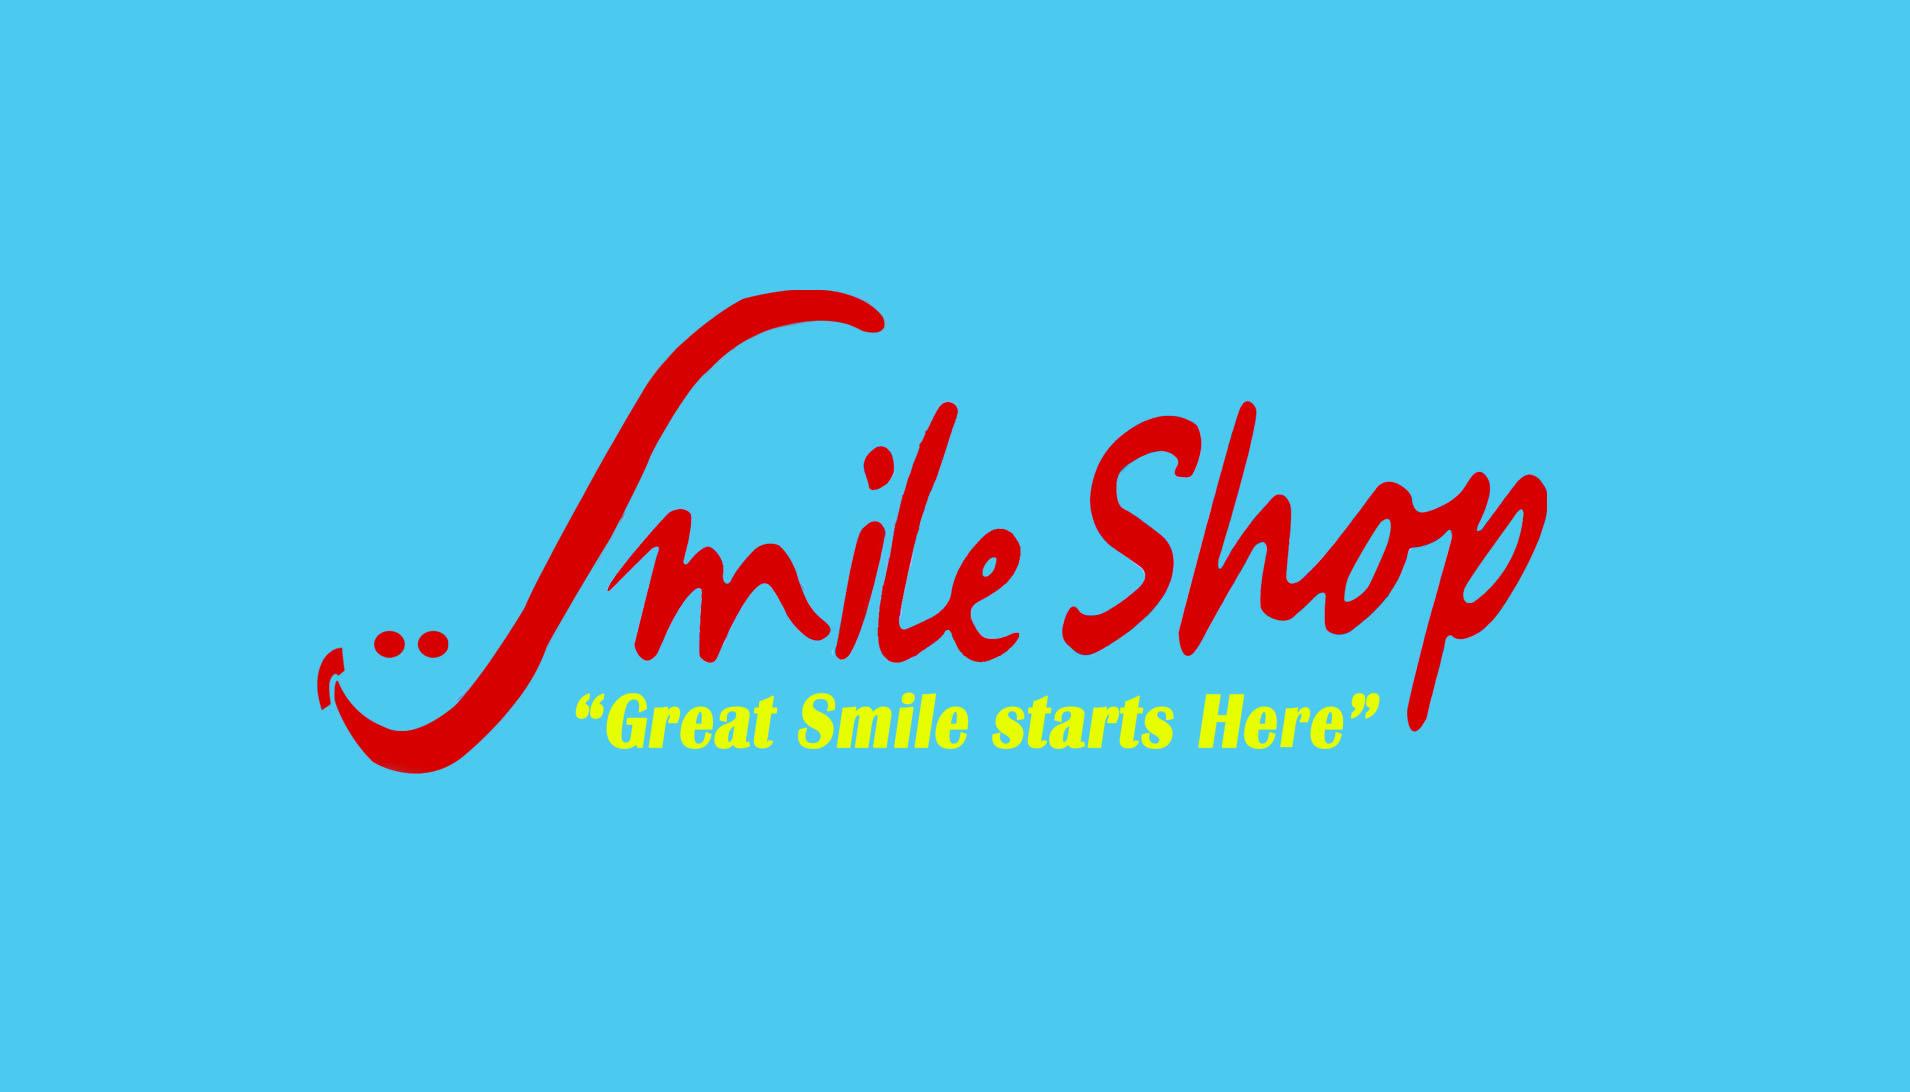 Smile Shop Dental Clinic